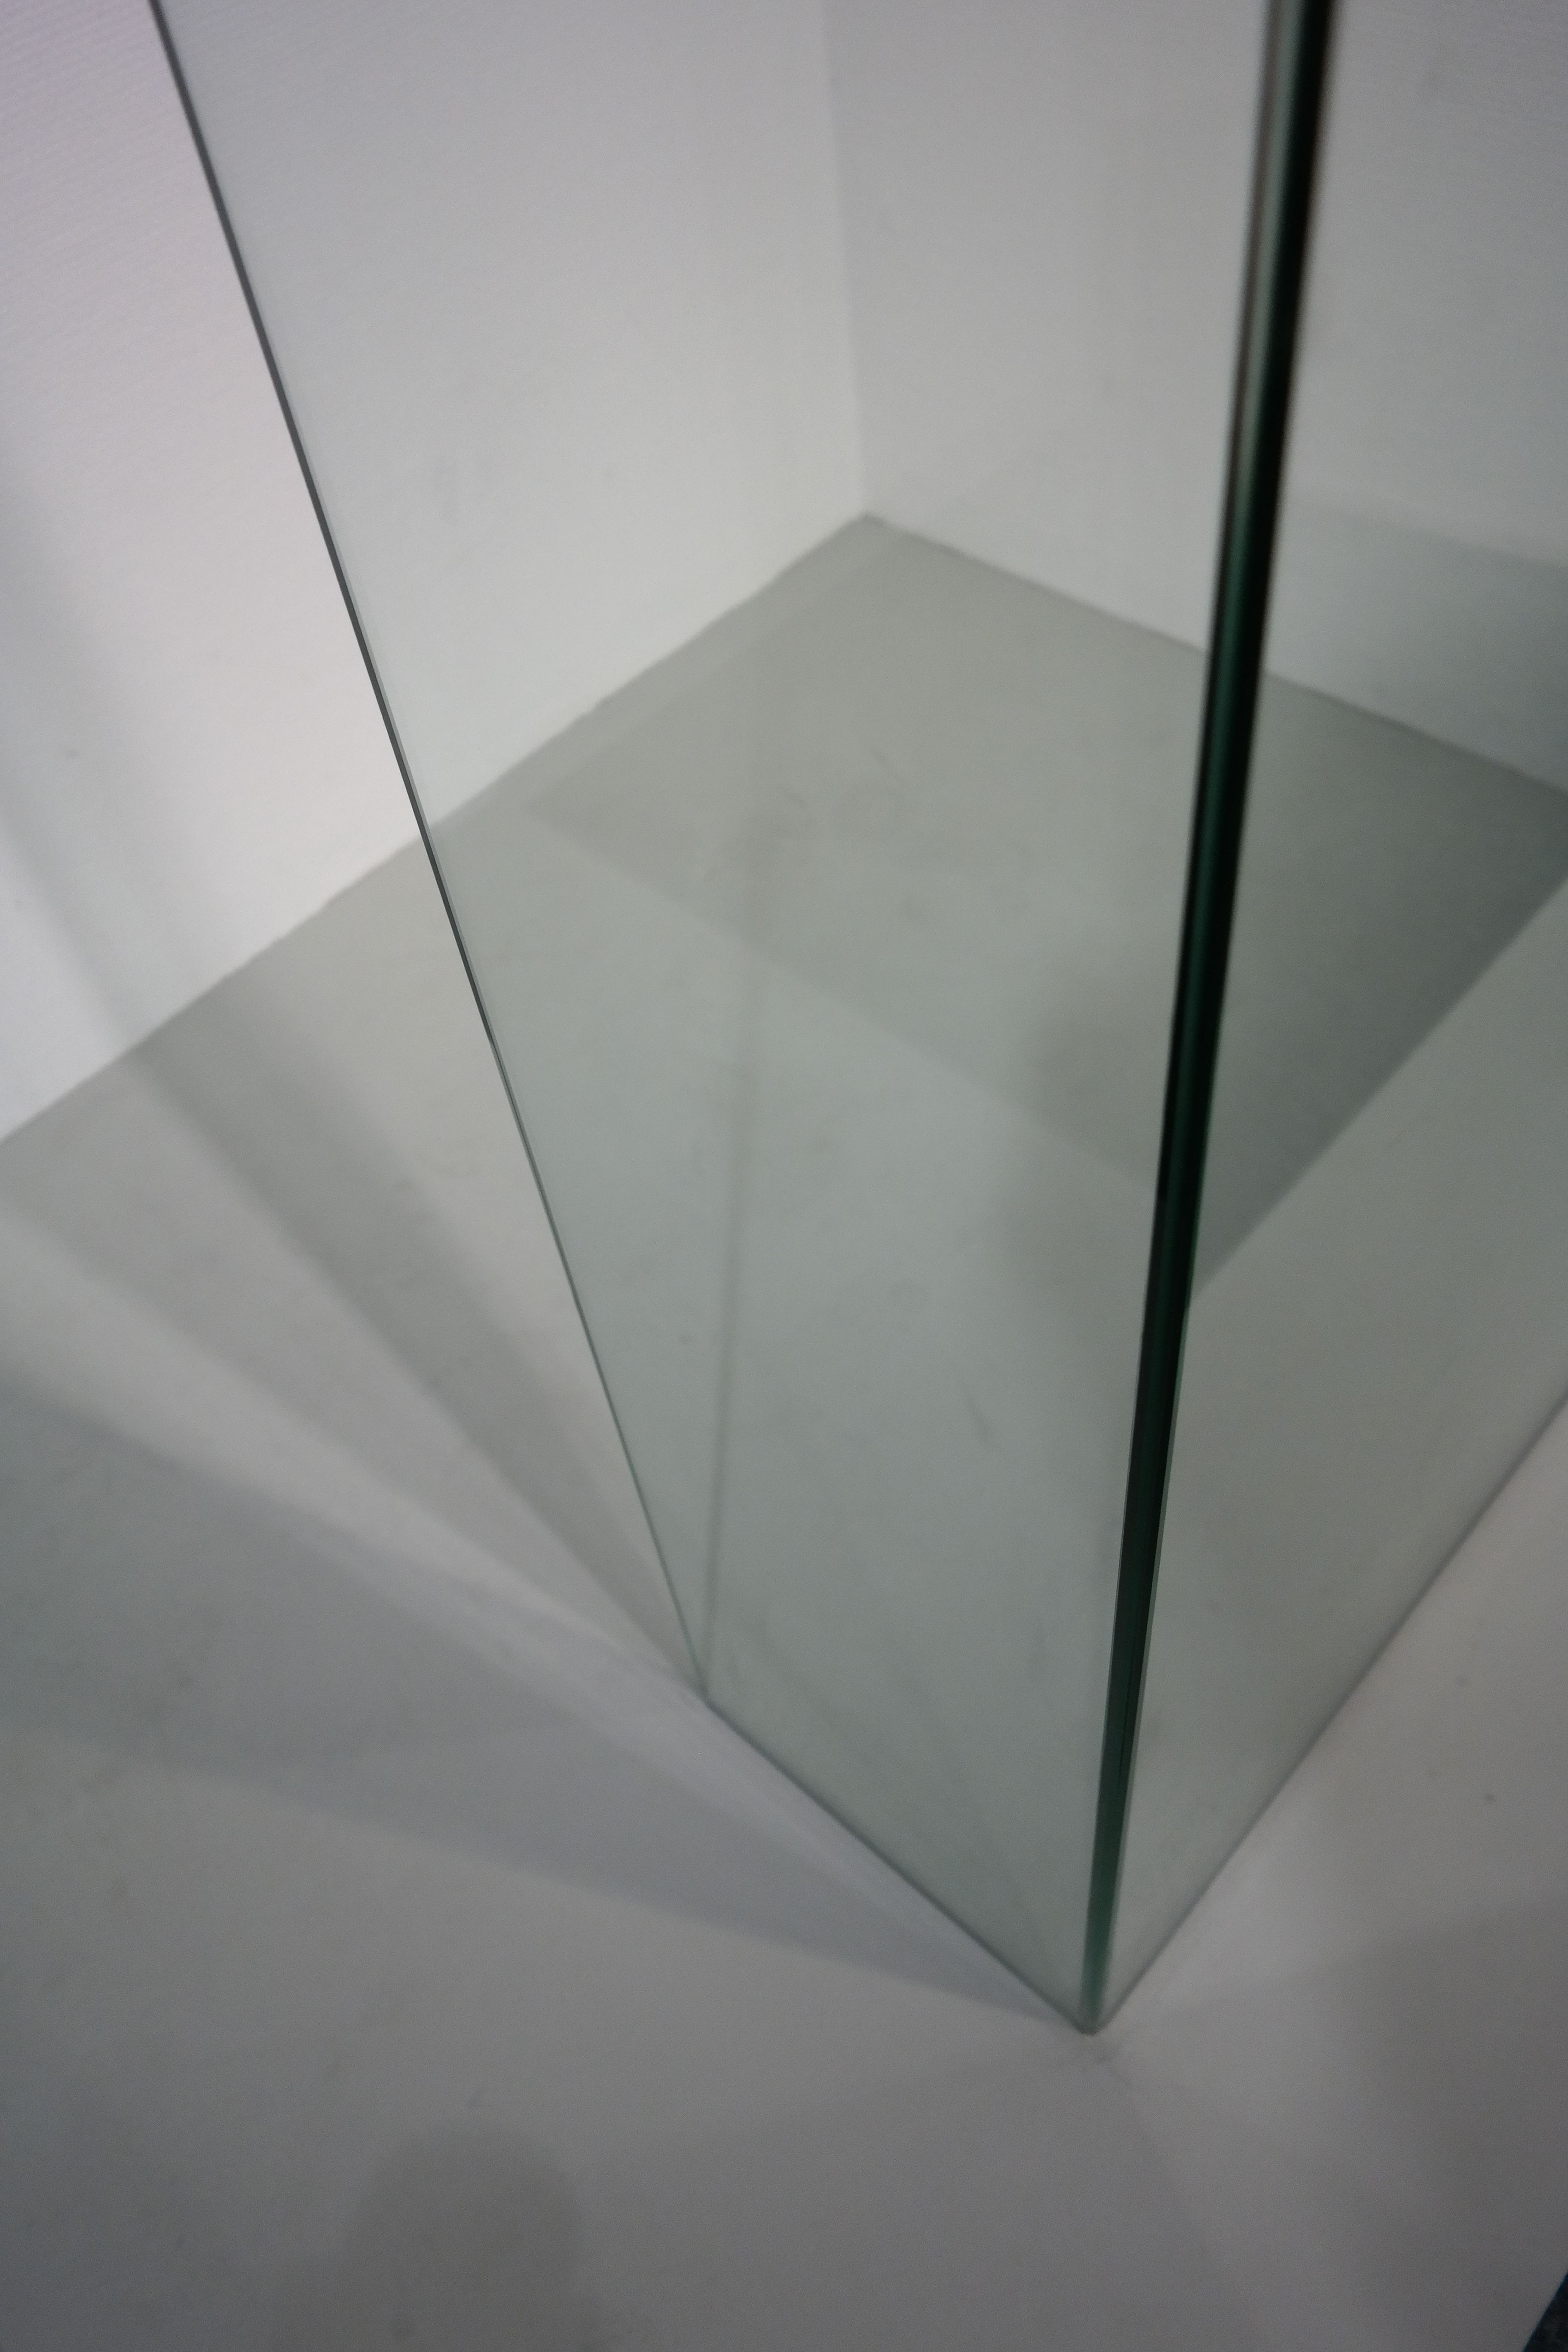 Douchewand Glas Hoek.Verstek Uv Verlijmde 90 Graden Hoek Glas Op Glas I Balance